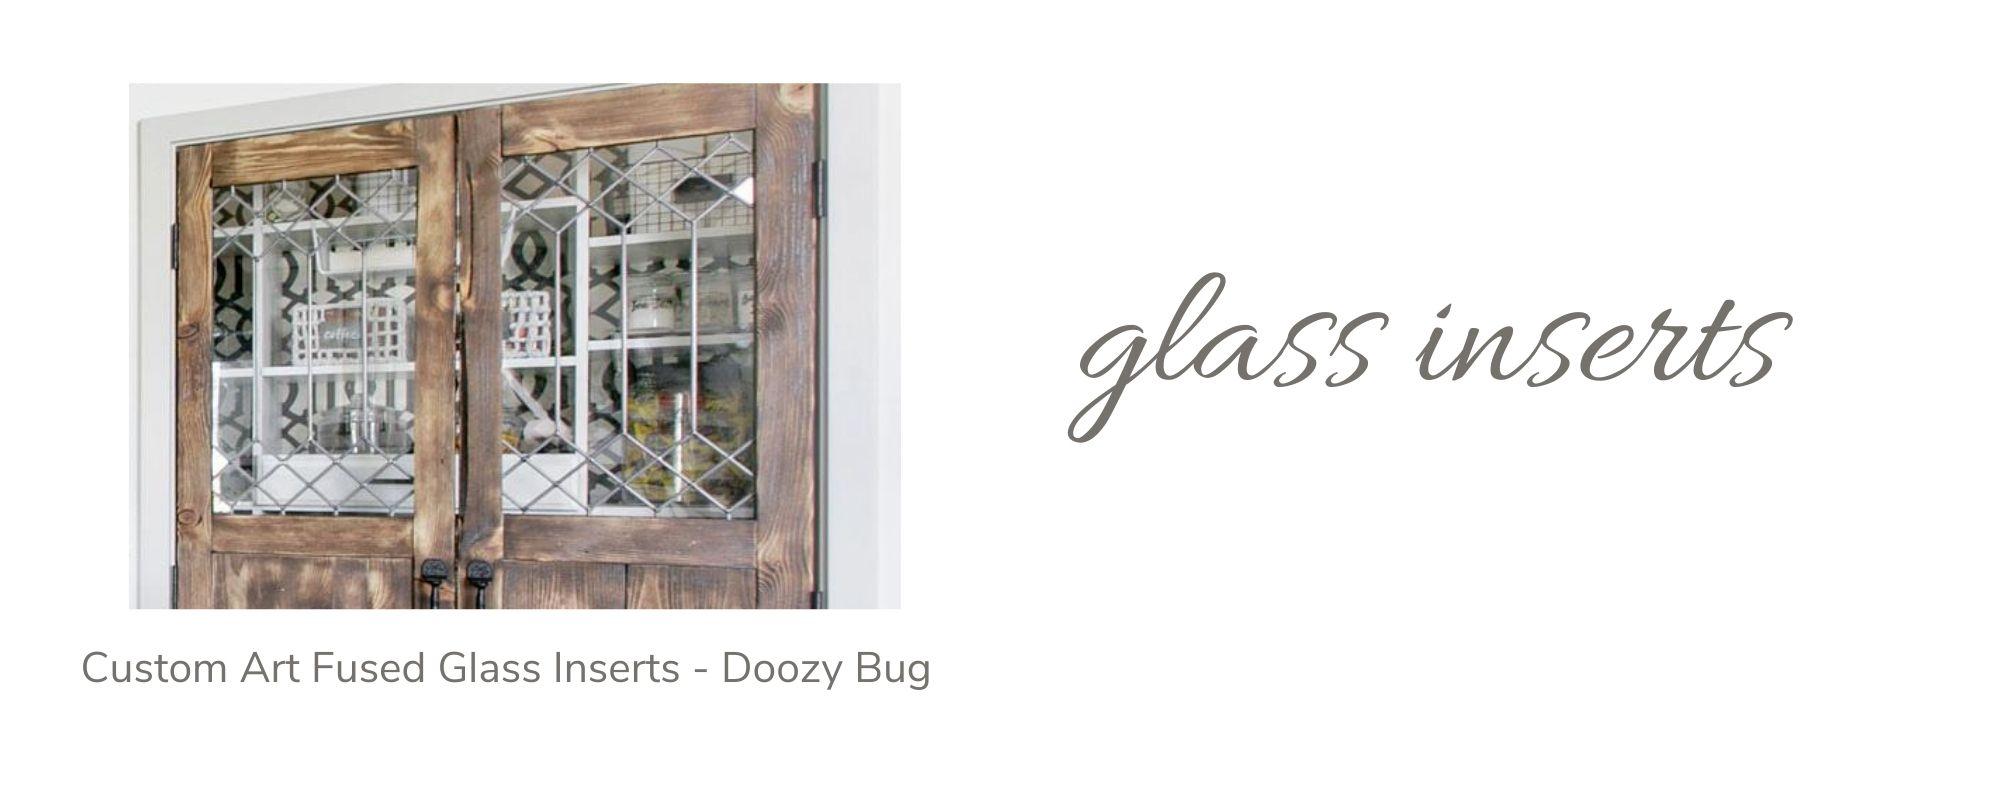 Custom Art Fused Glass Inserts by Doozy Bug